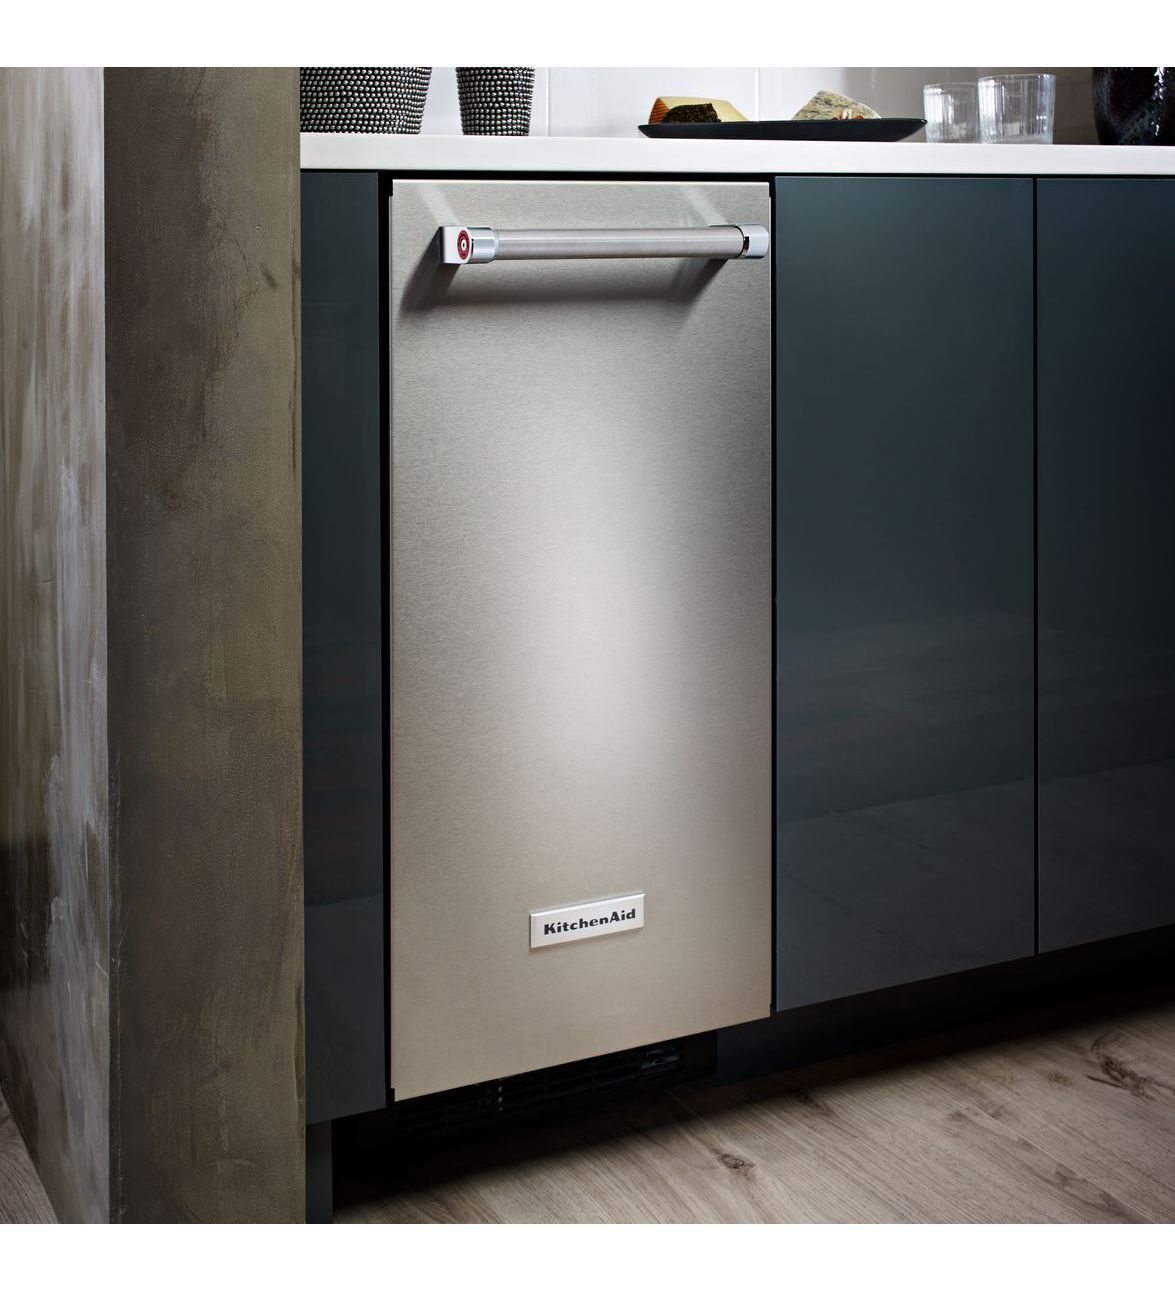 Kitchenaid Undercounter Ice Maker